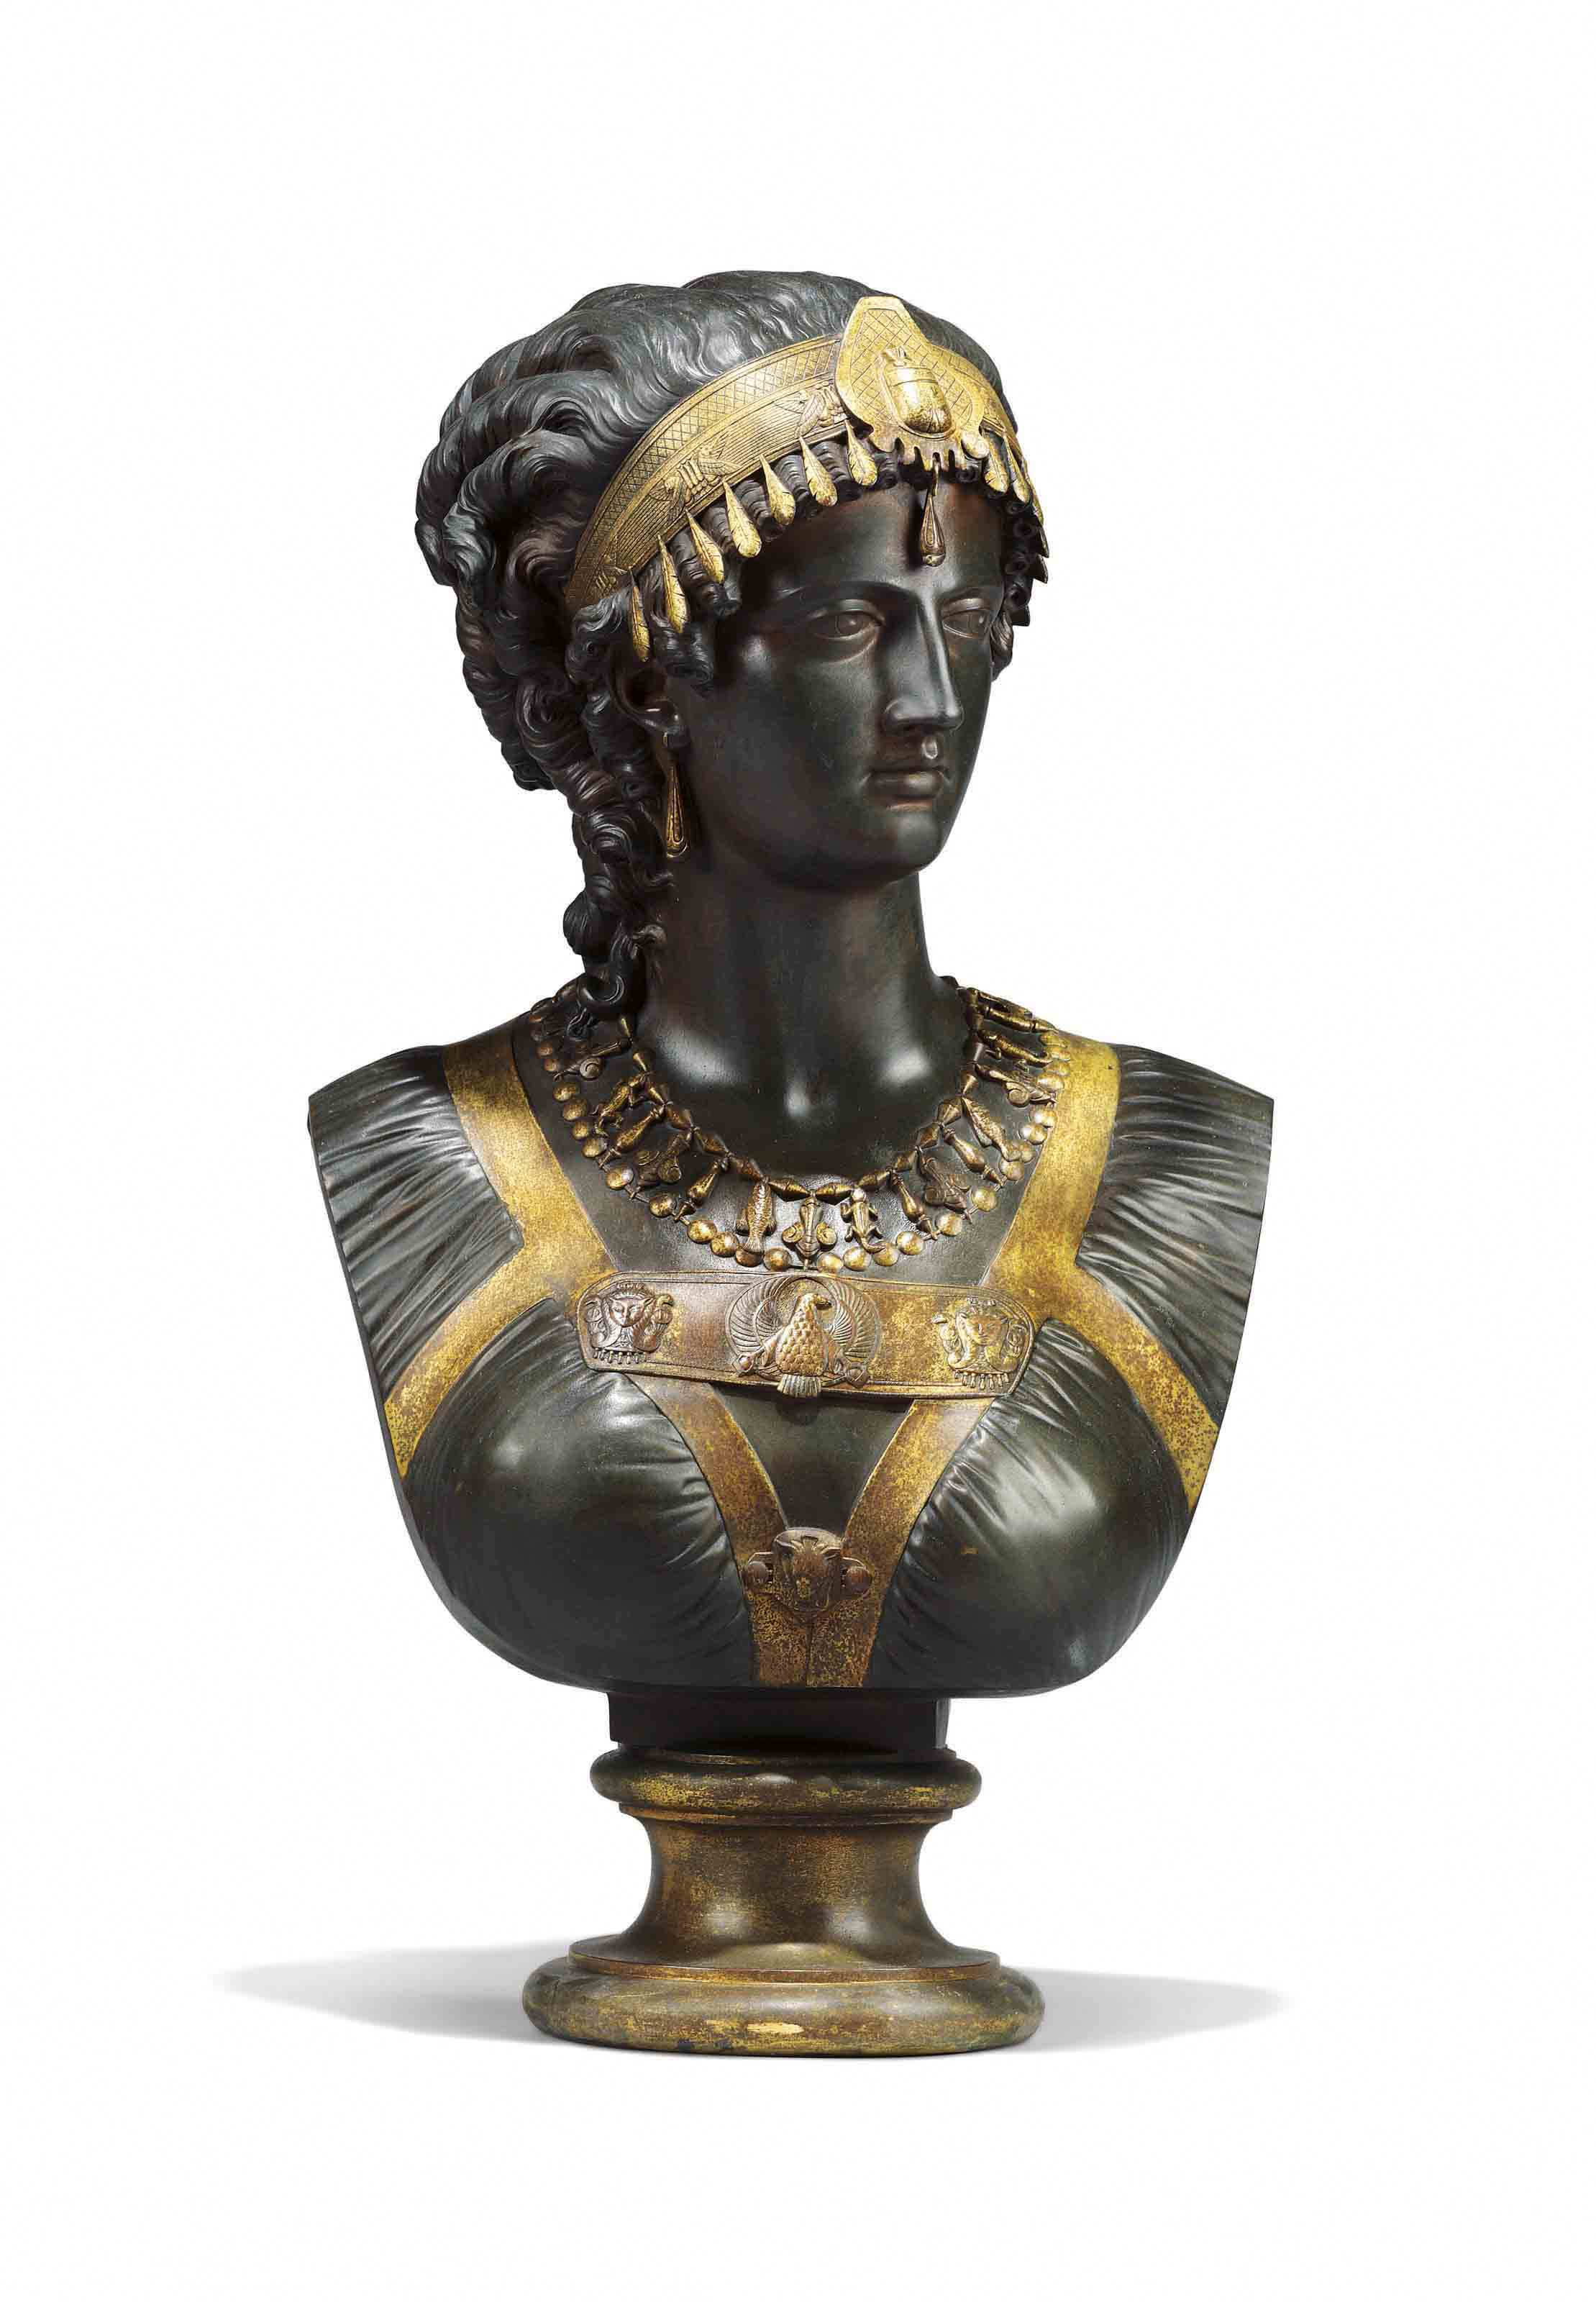 Cléopâtre (Cleopatra)